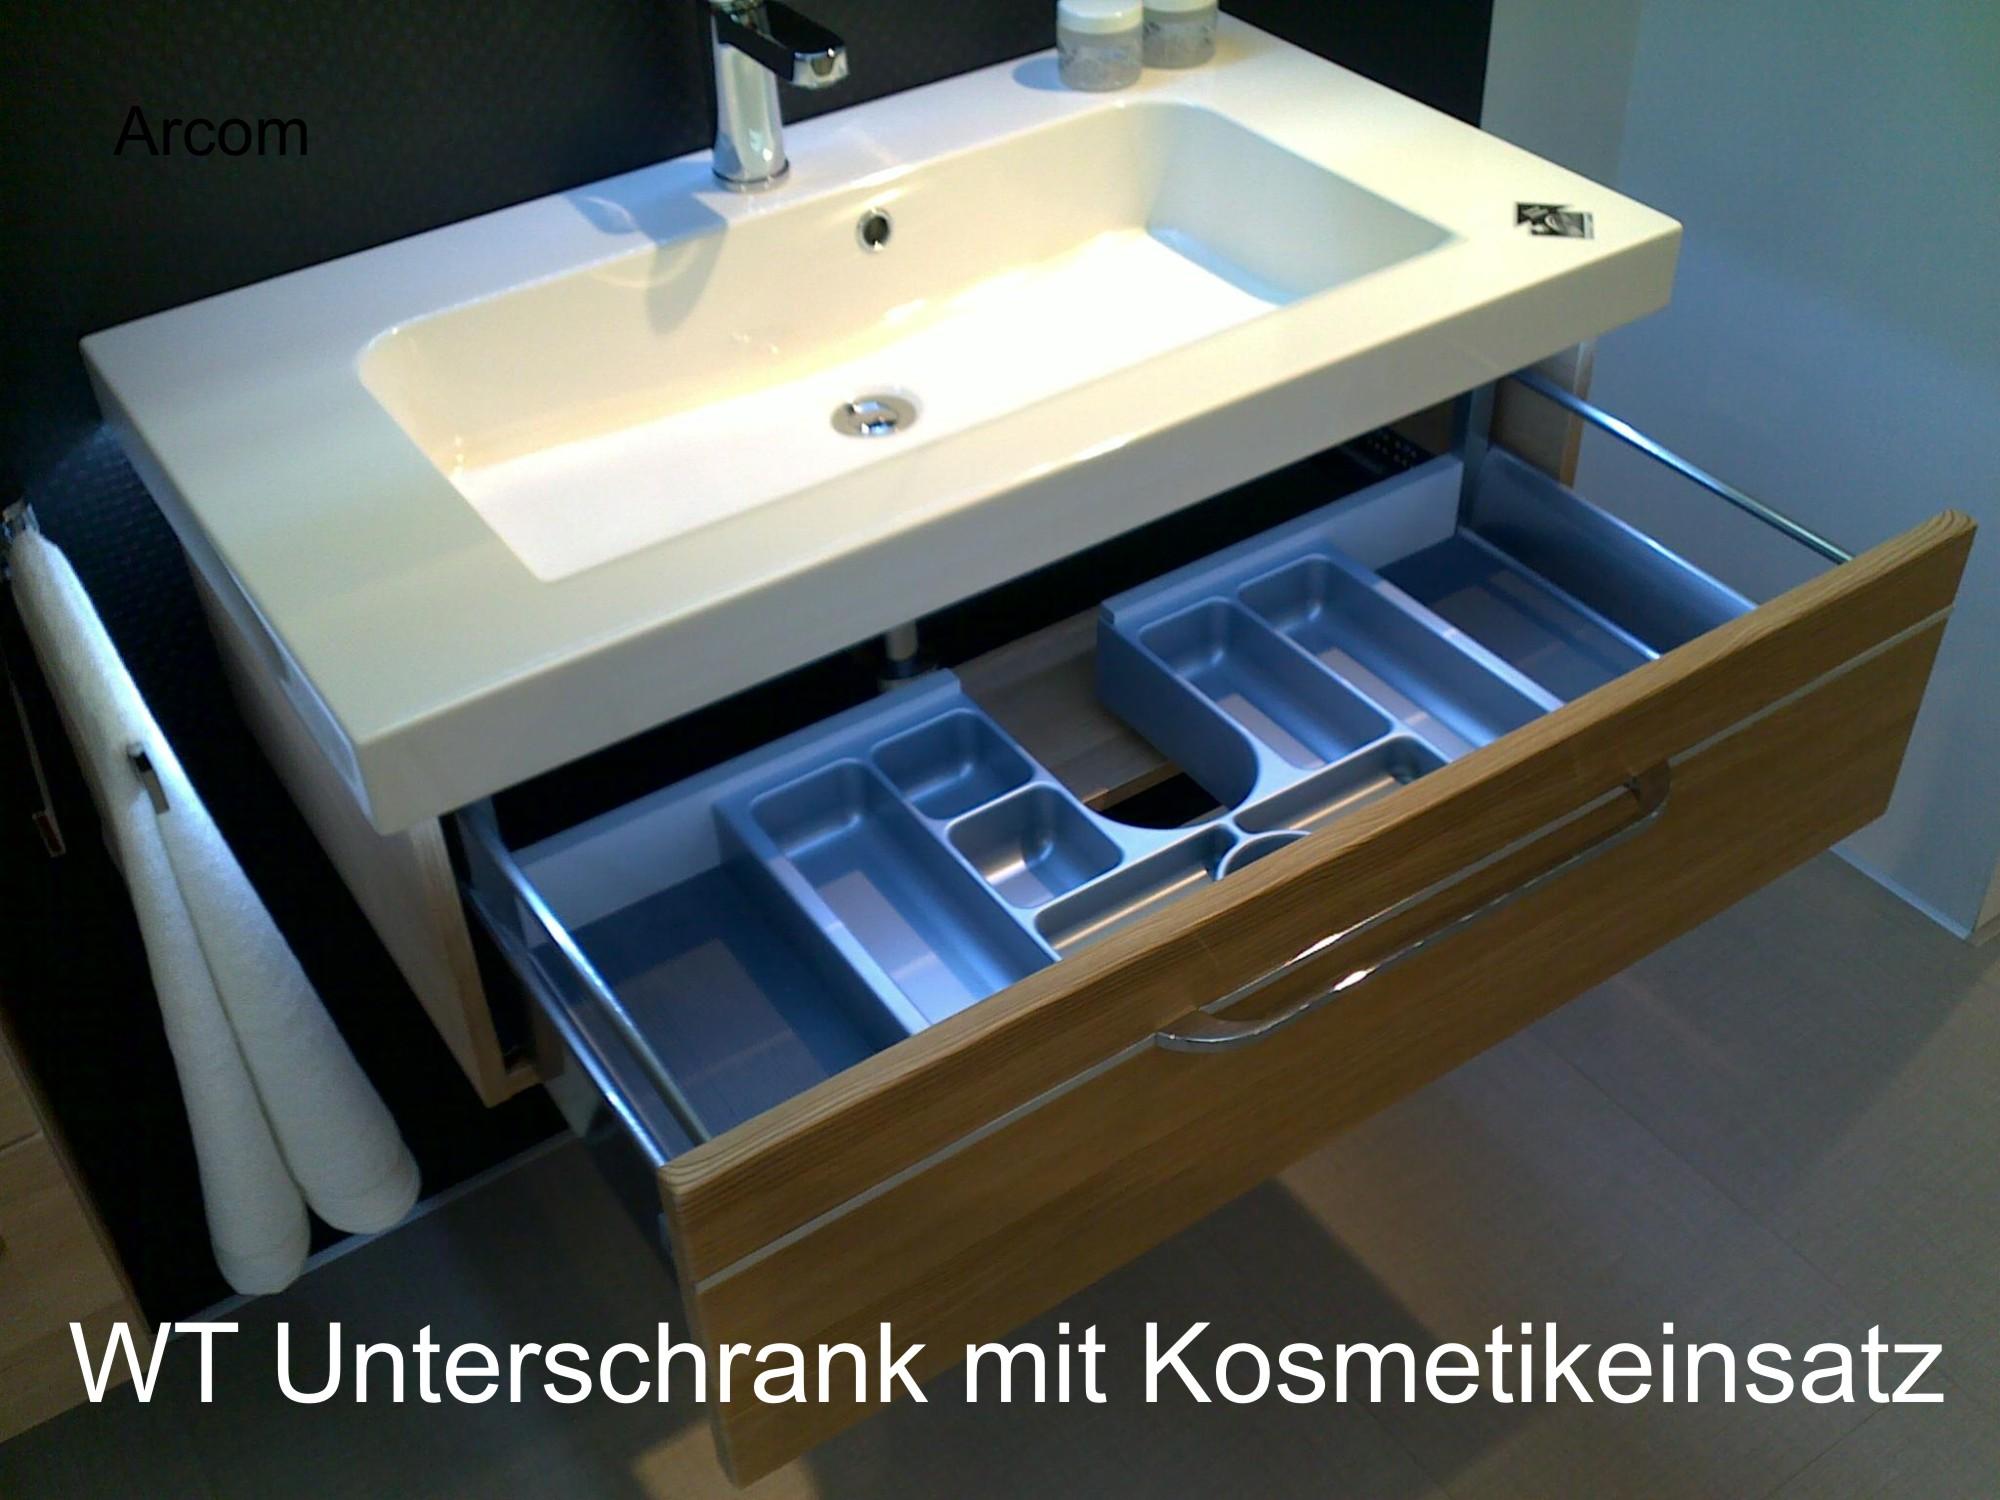 pelipal balto waschtischunterschrank 123 cm arcom center. Black Bedroom Furniture Sets. Home Design Ideas